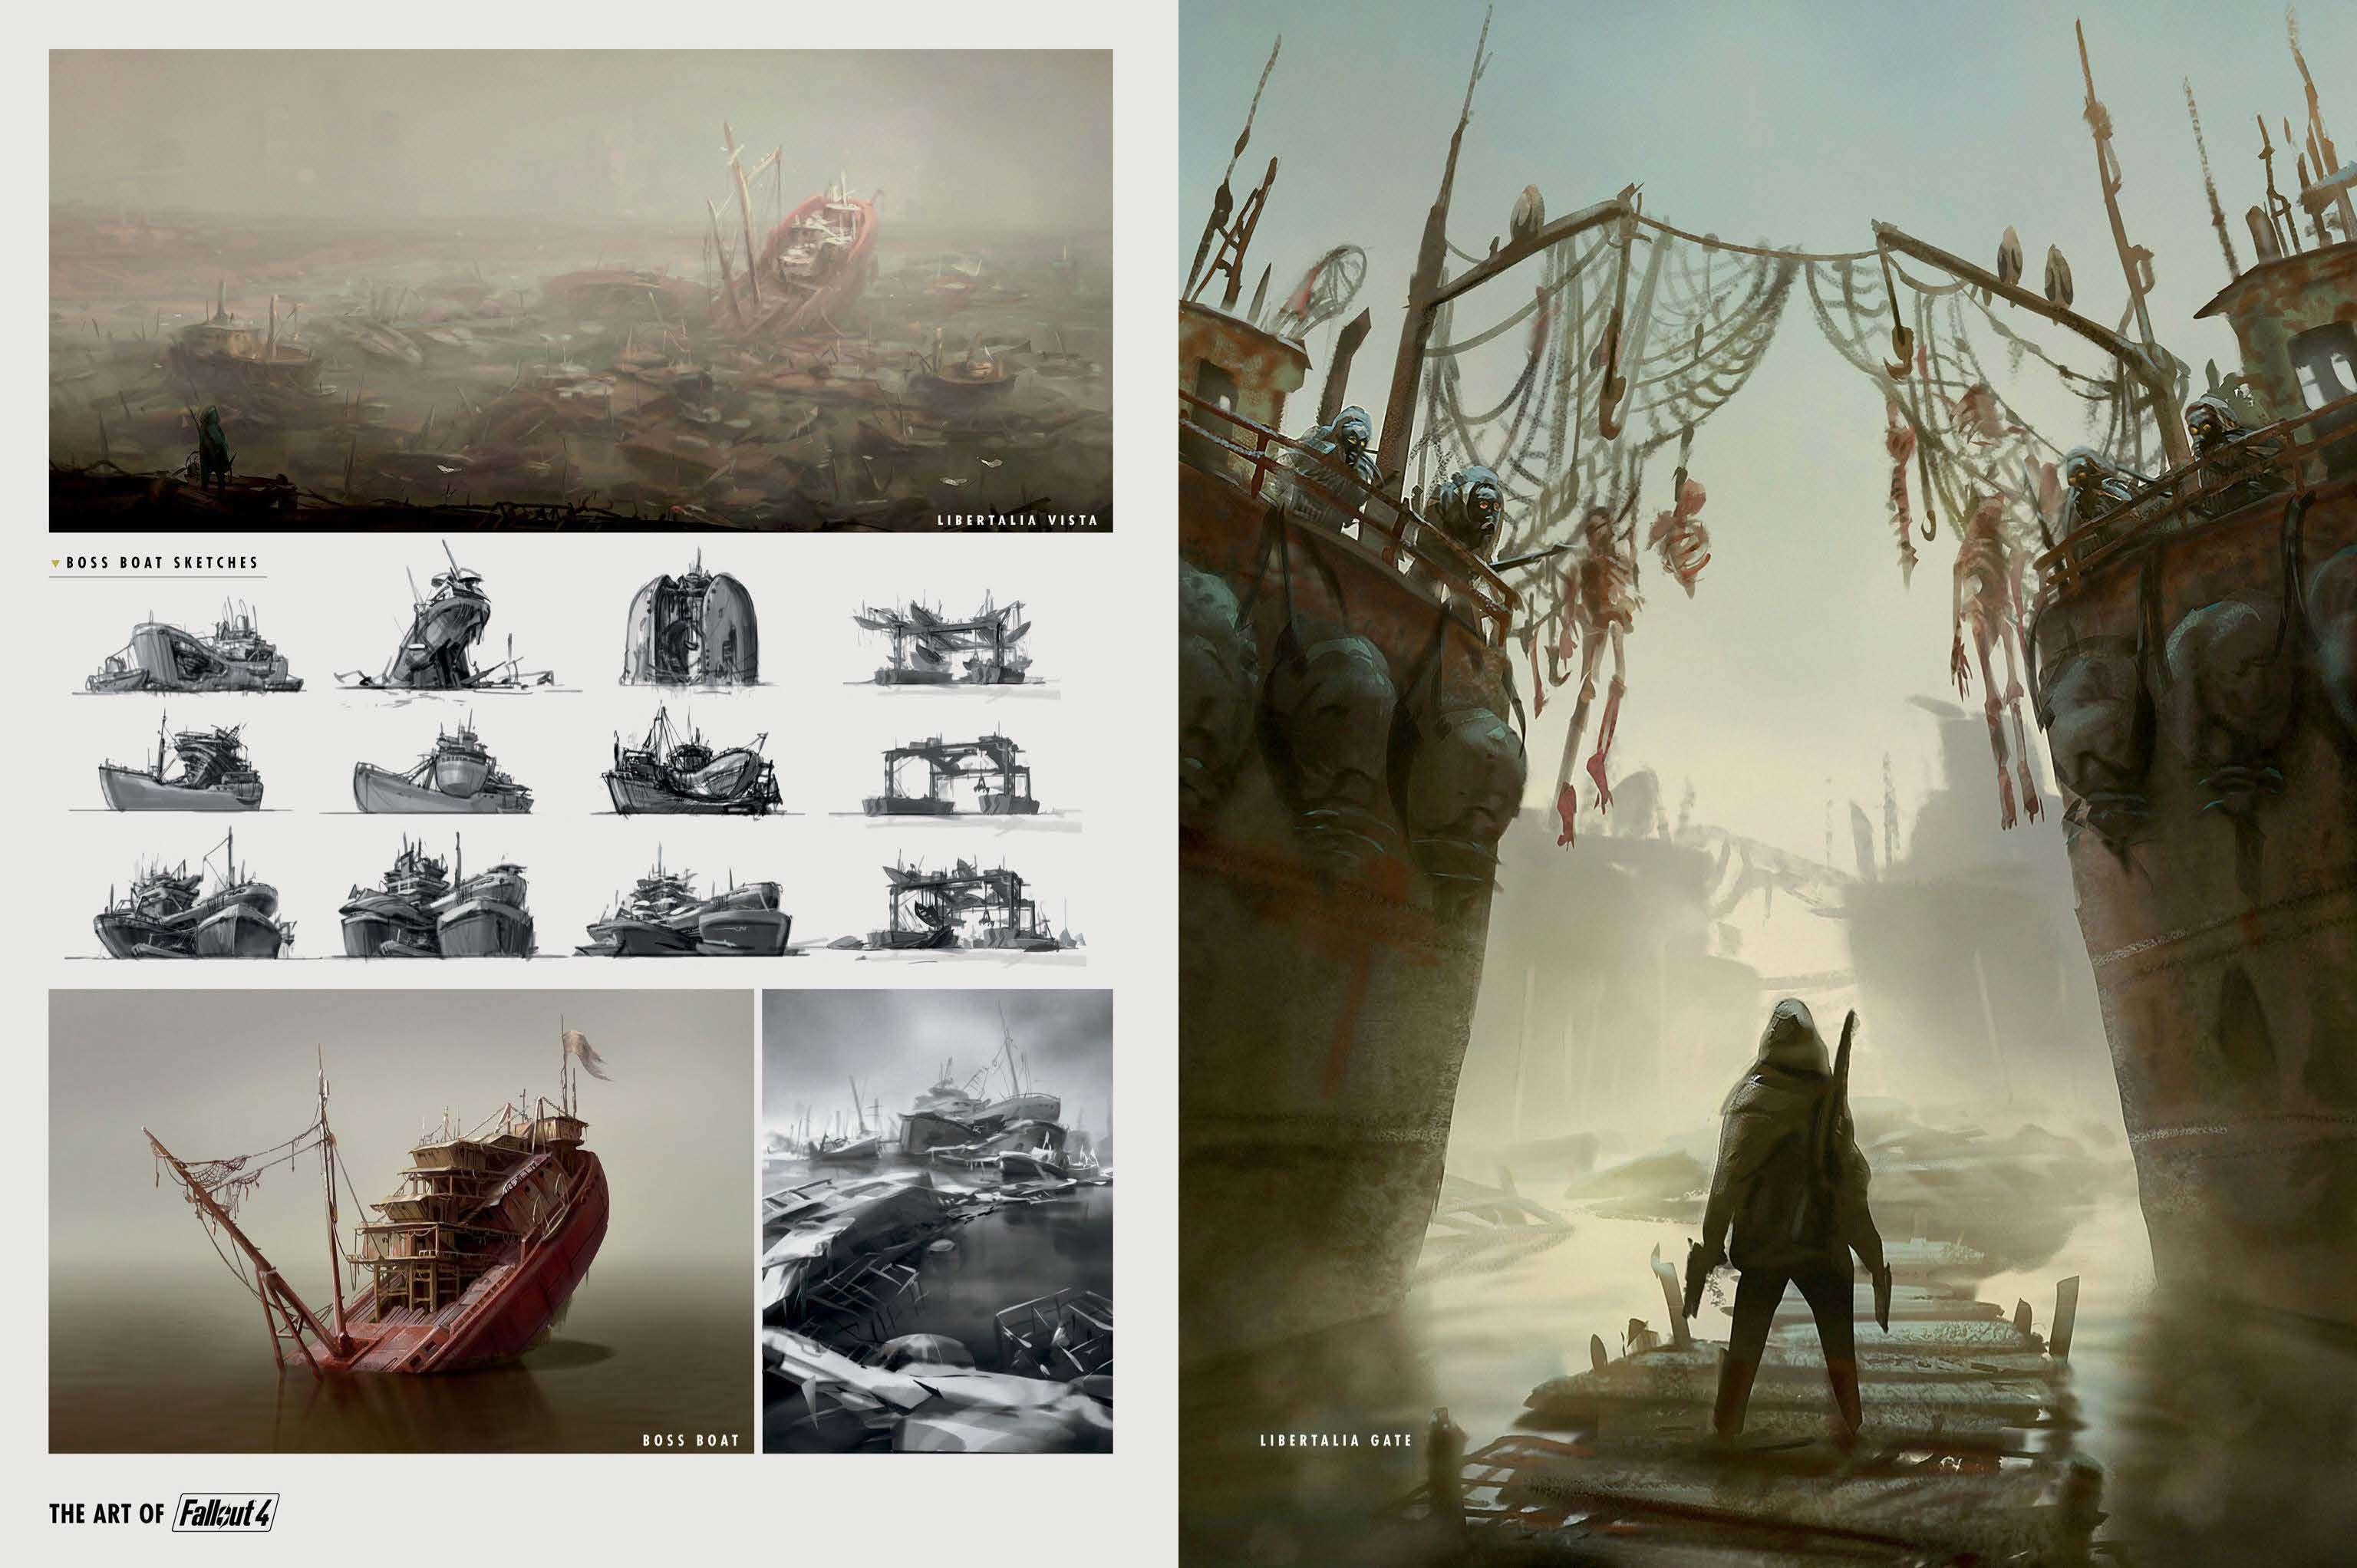 The Art of Fallout 4 - # 029 - Fallout 4 Артбук